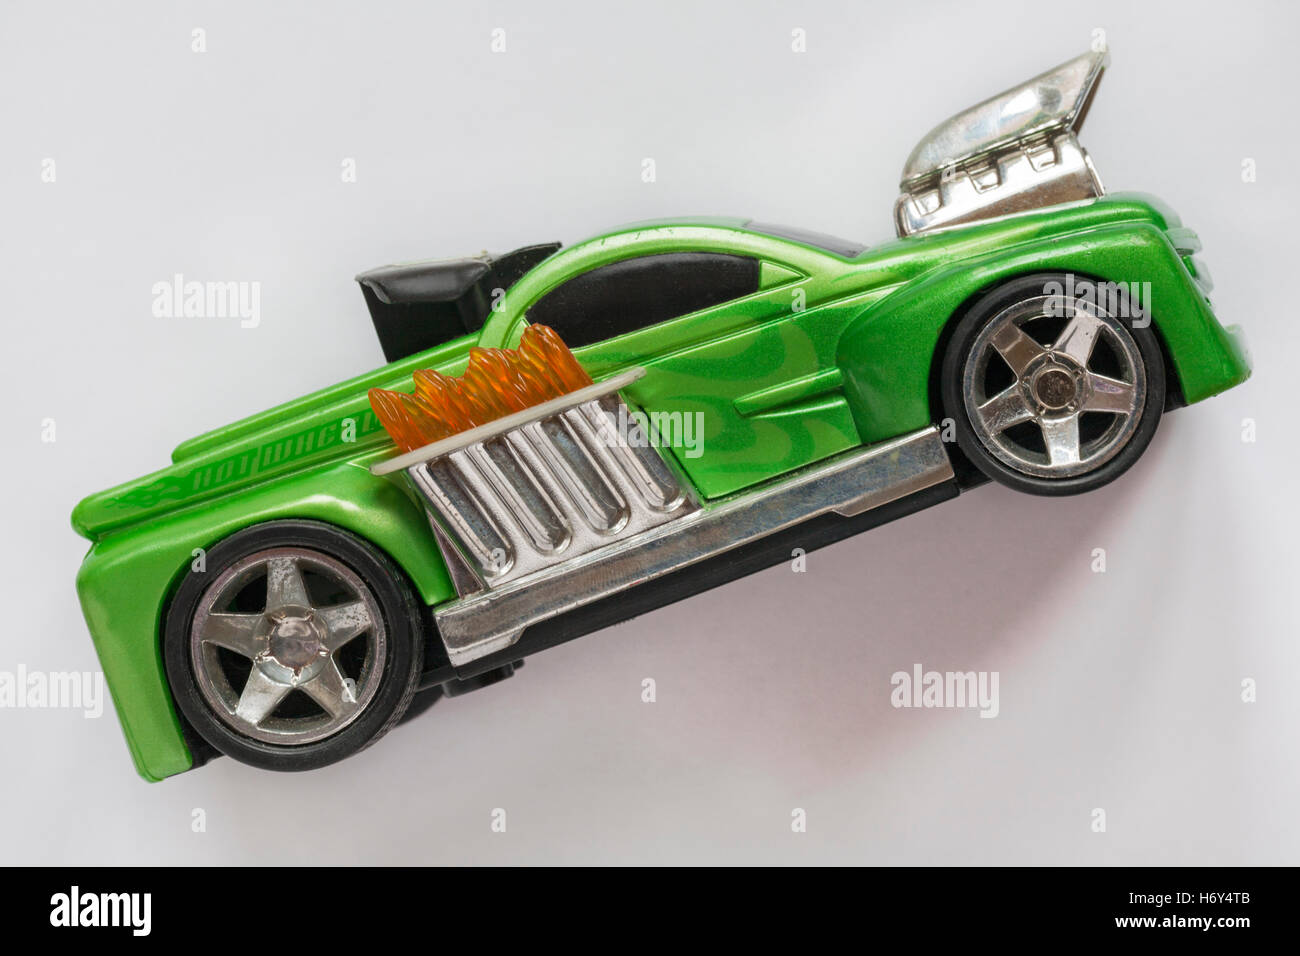 hot wheels toy car stockfotos hot wheels toy car bilder. Black Bedroom Furniture Sets. Home Design Ideas